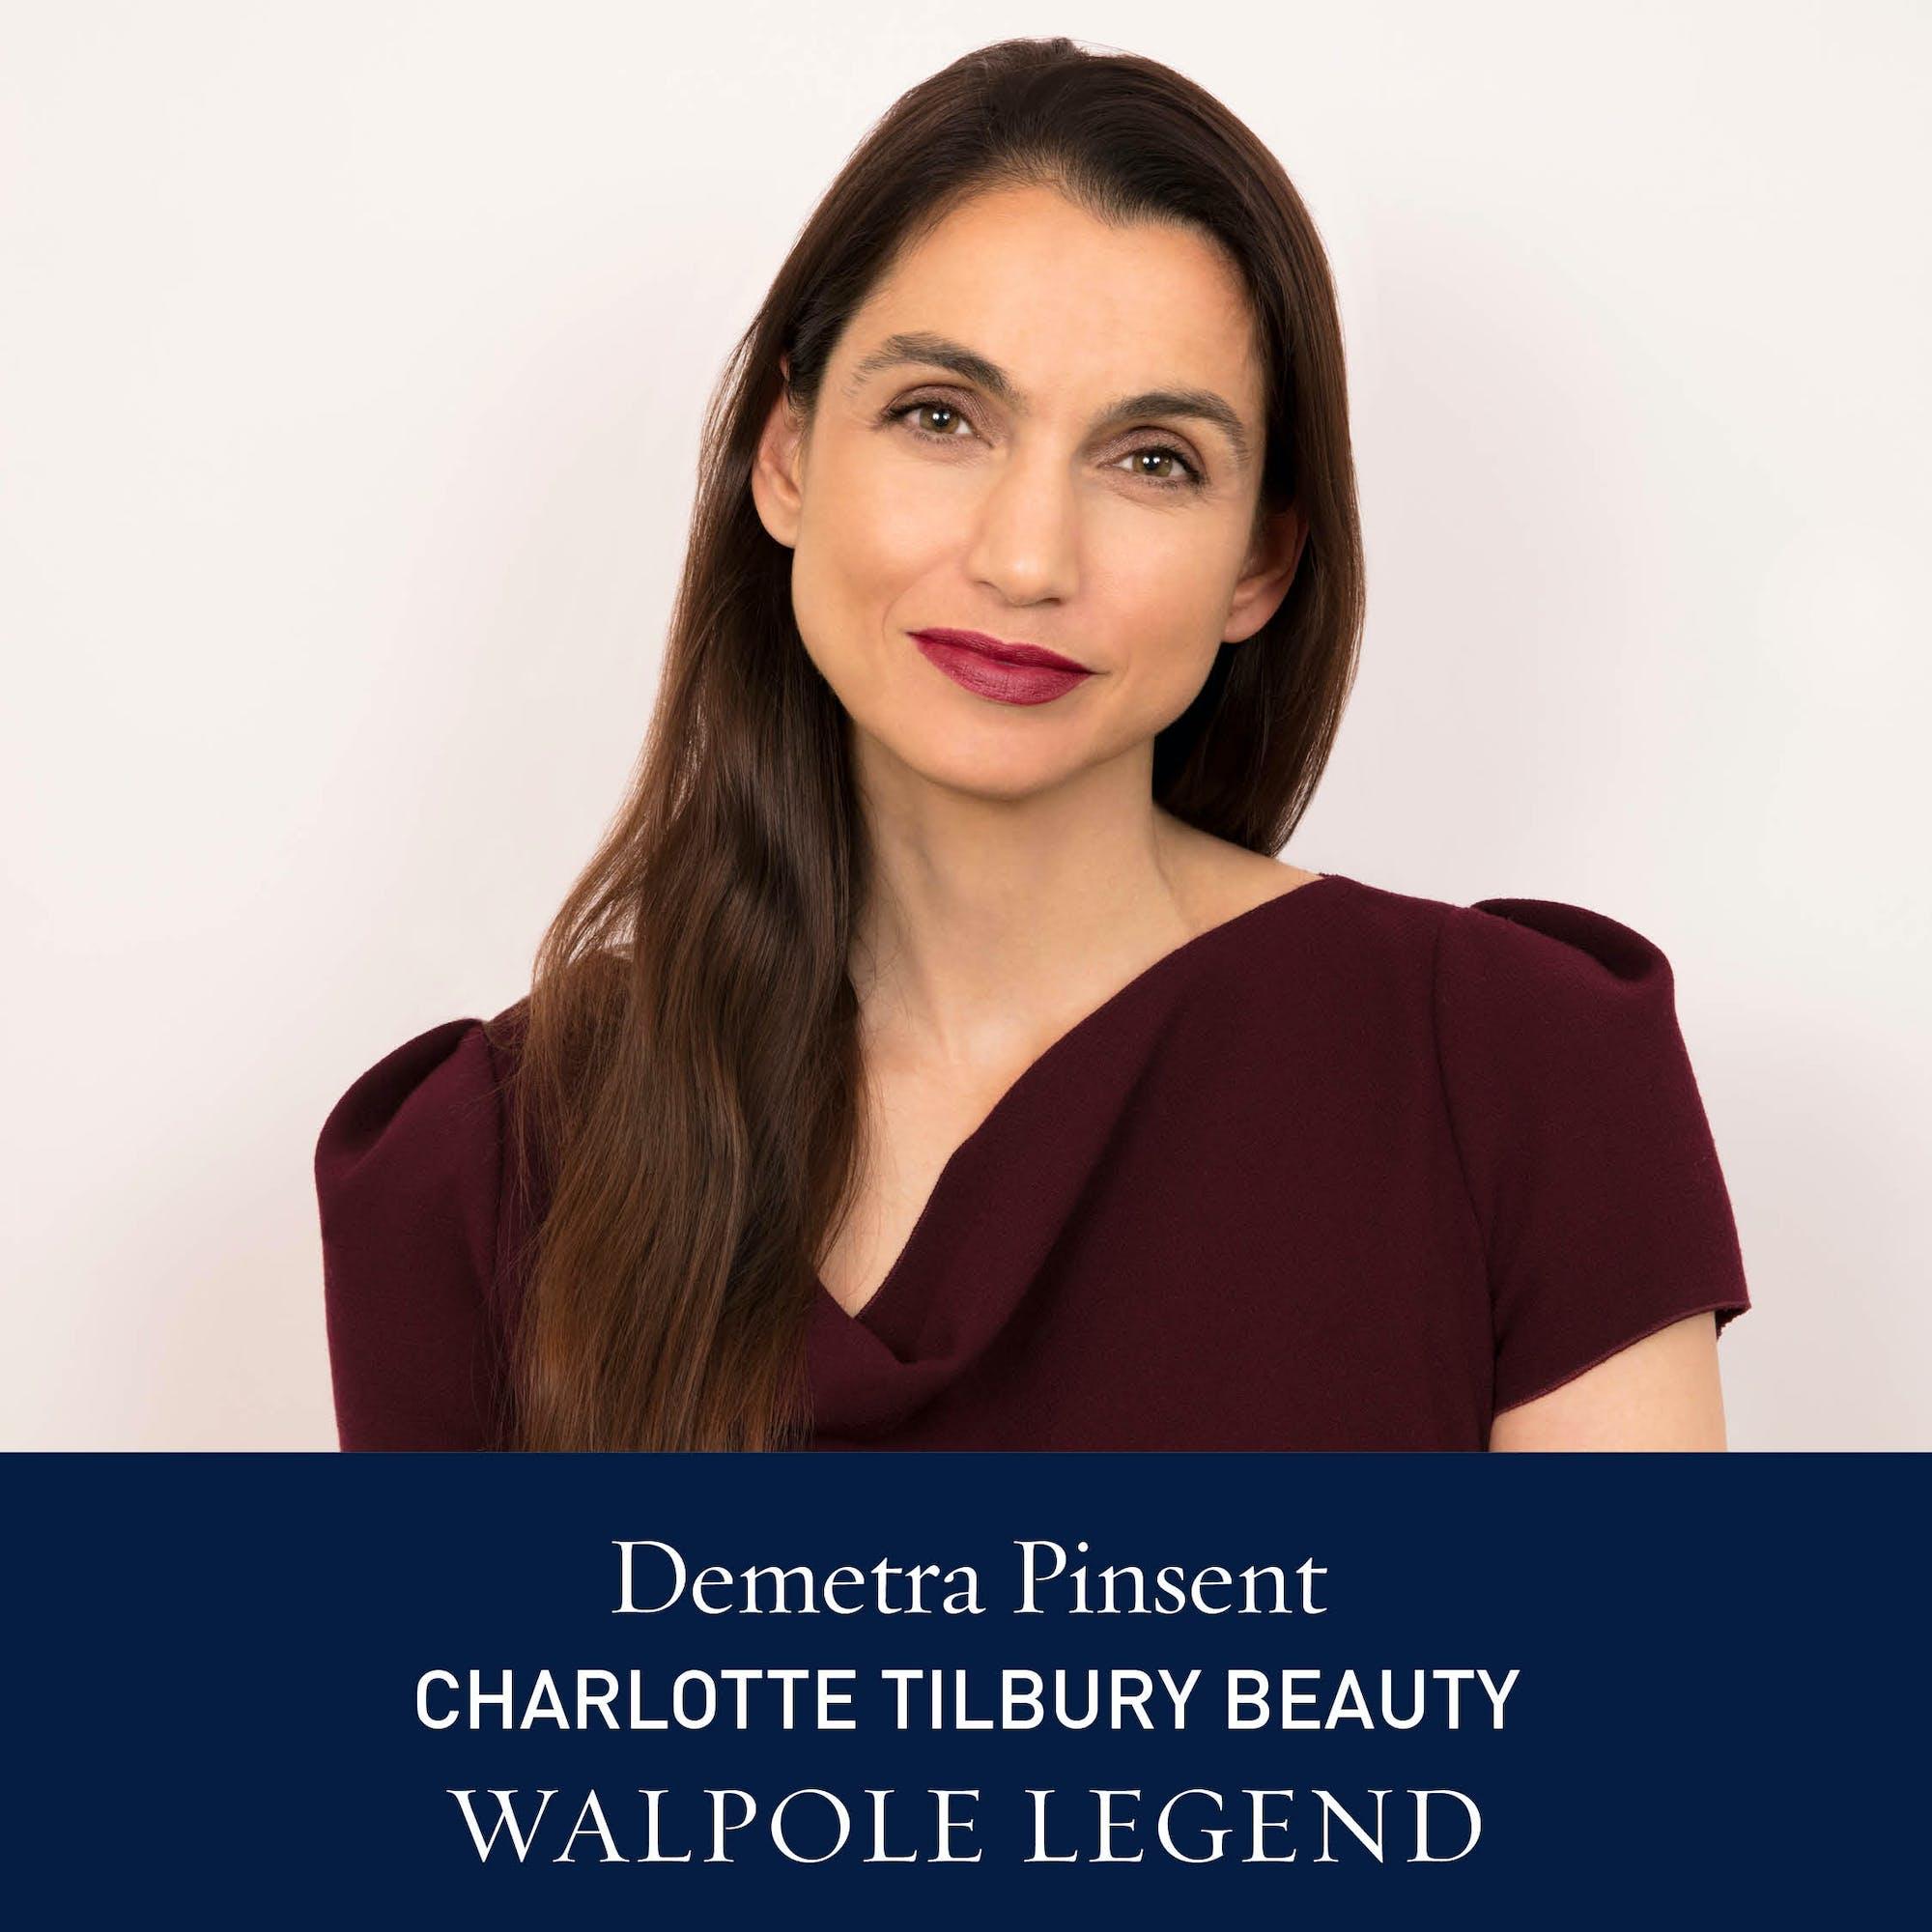 The Walpole Power List 2020  The Legends: Demetra Pinsent, CEO, Charlotte Tilbury Beauty